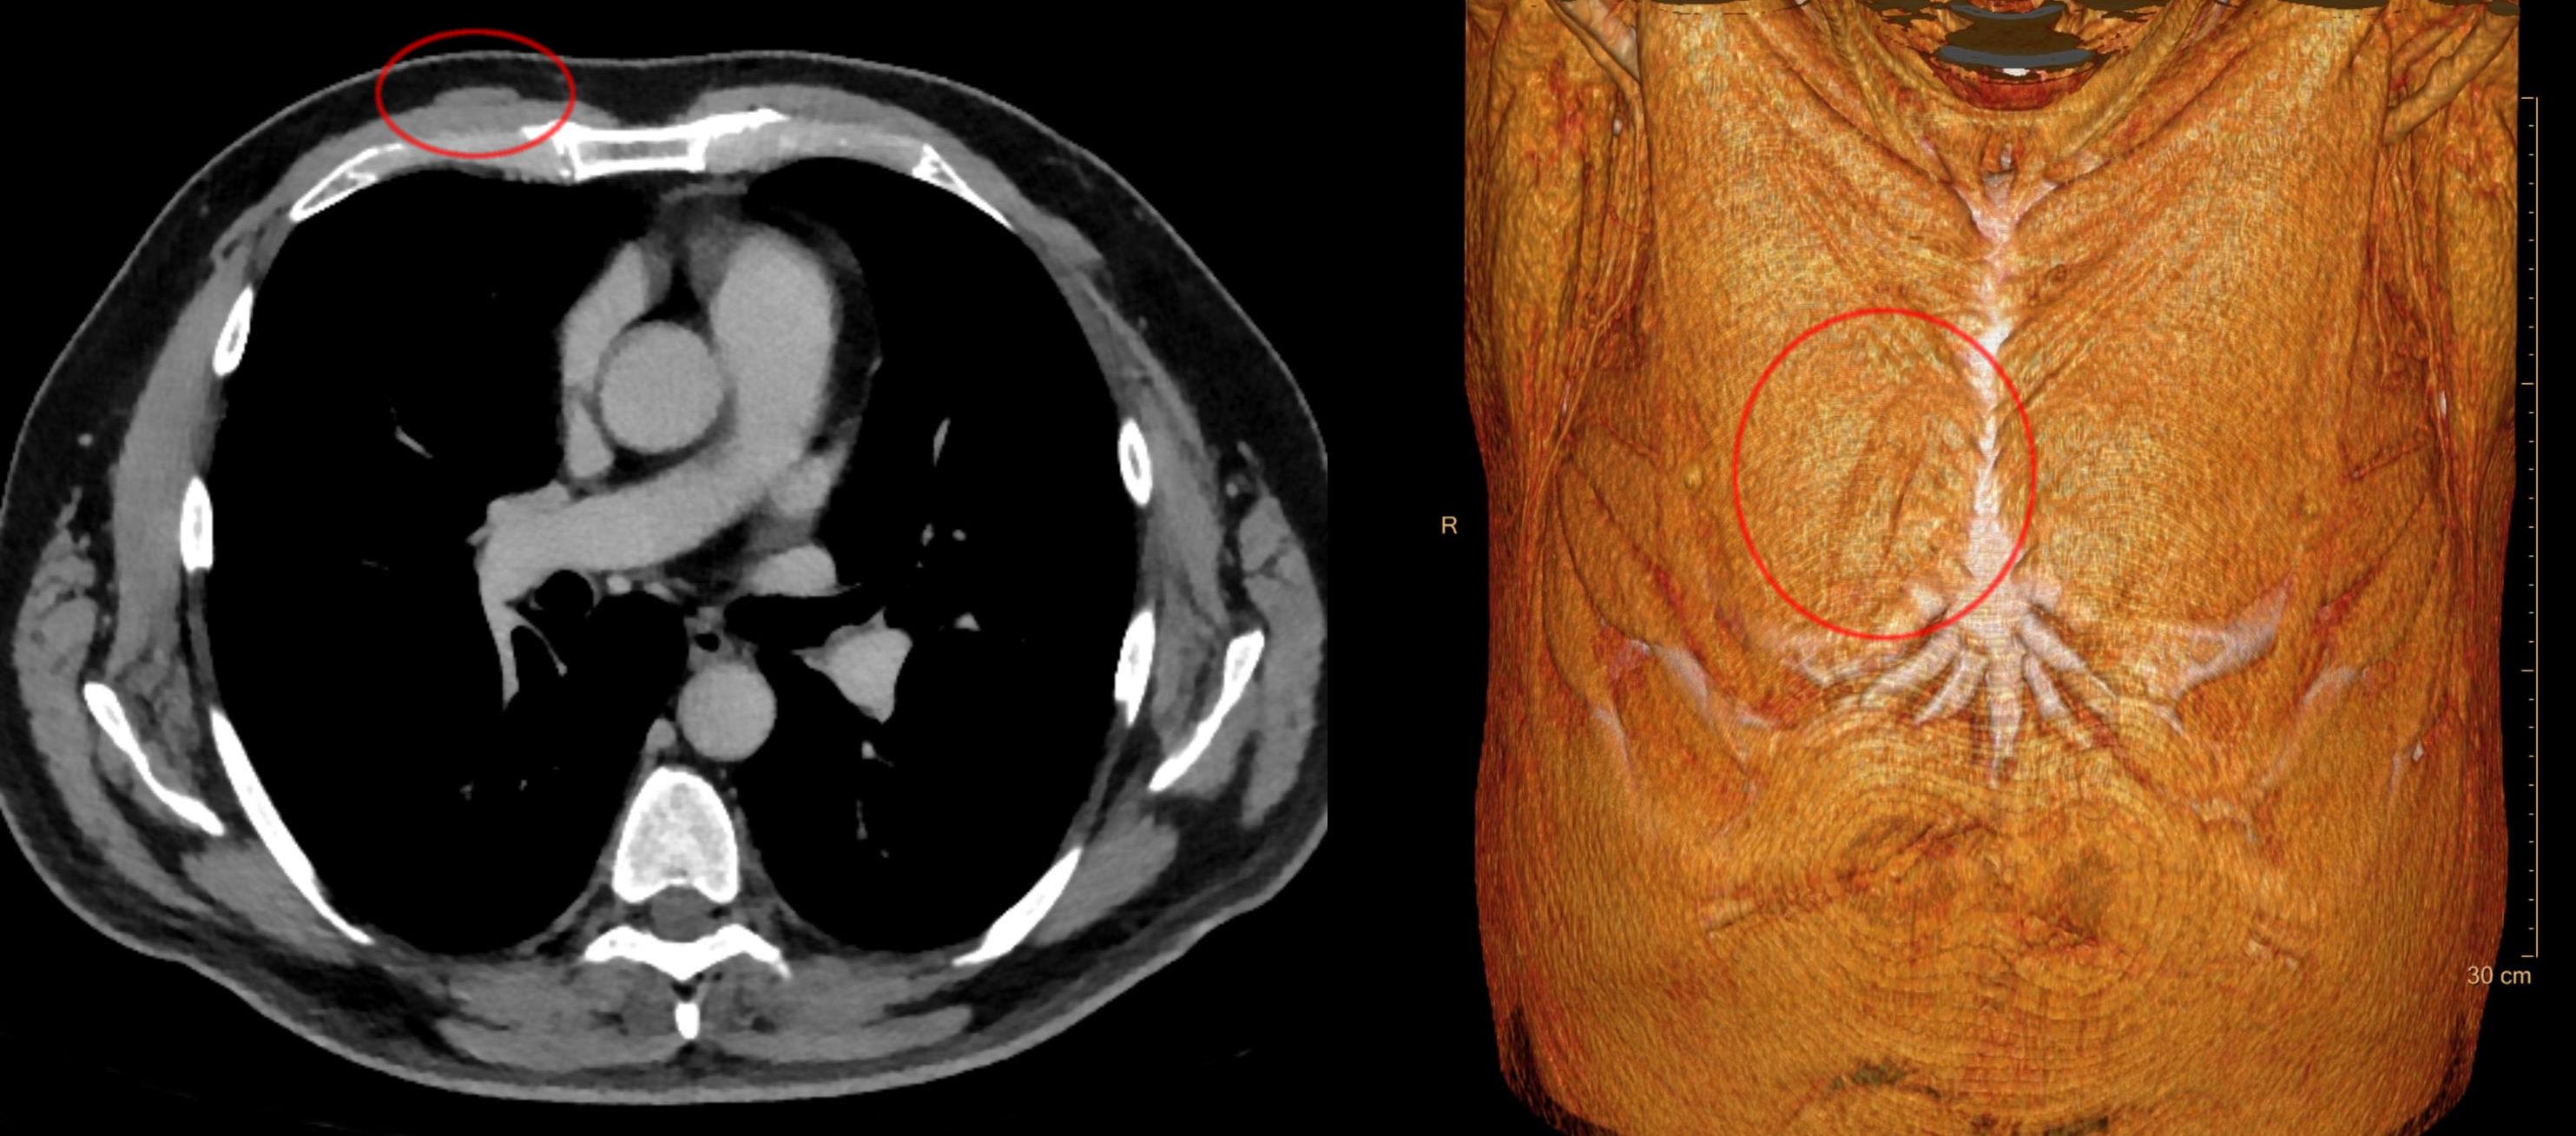 File:Musculus sternalis rechts - CT axial und Volume rendering - 001 ...